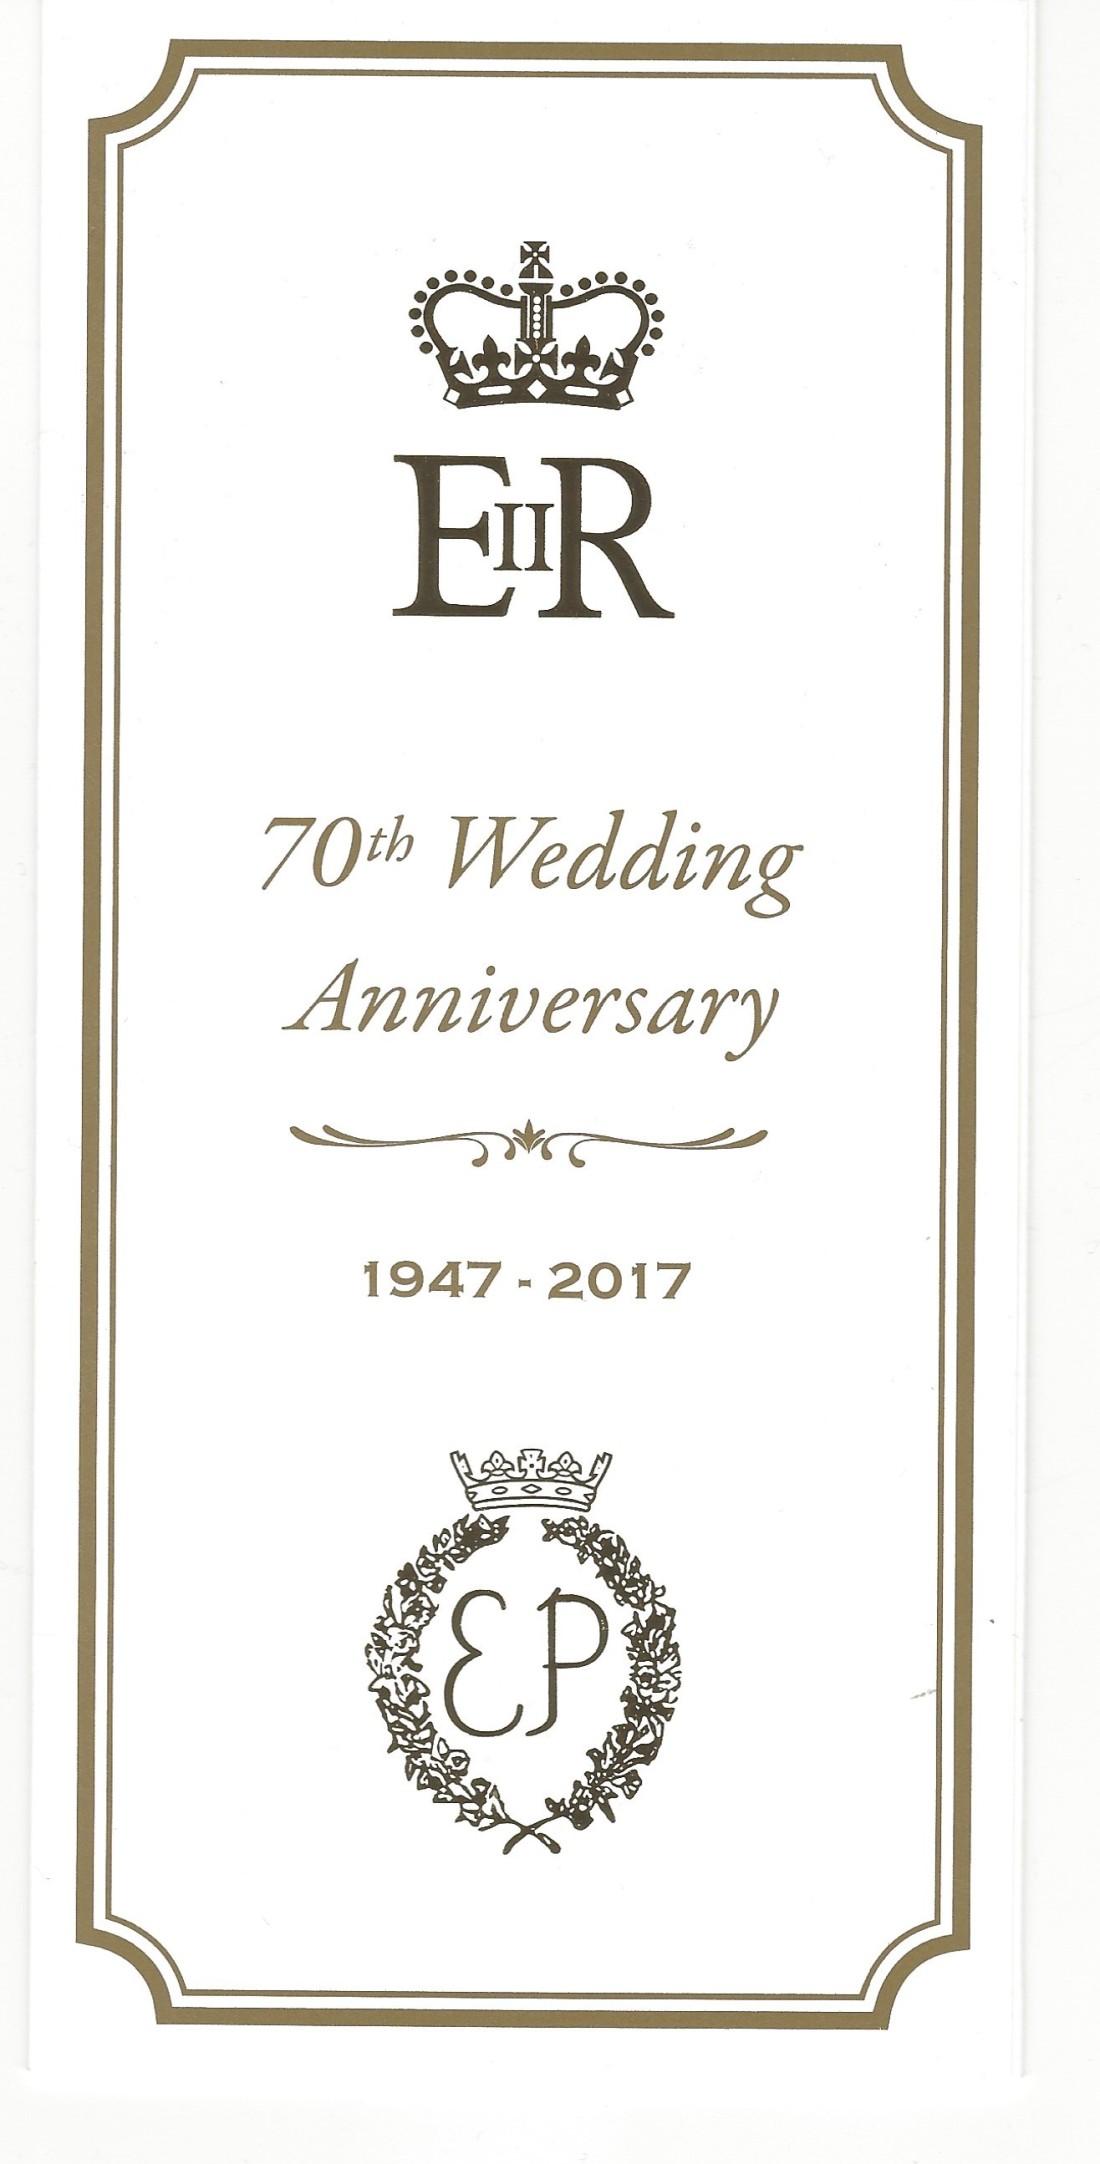 70th Wedding Anniversary.70th Wedding Anniversary Royalresponses